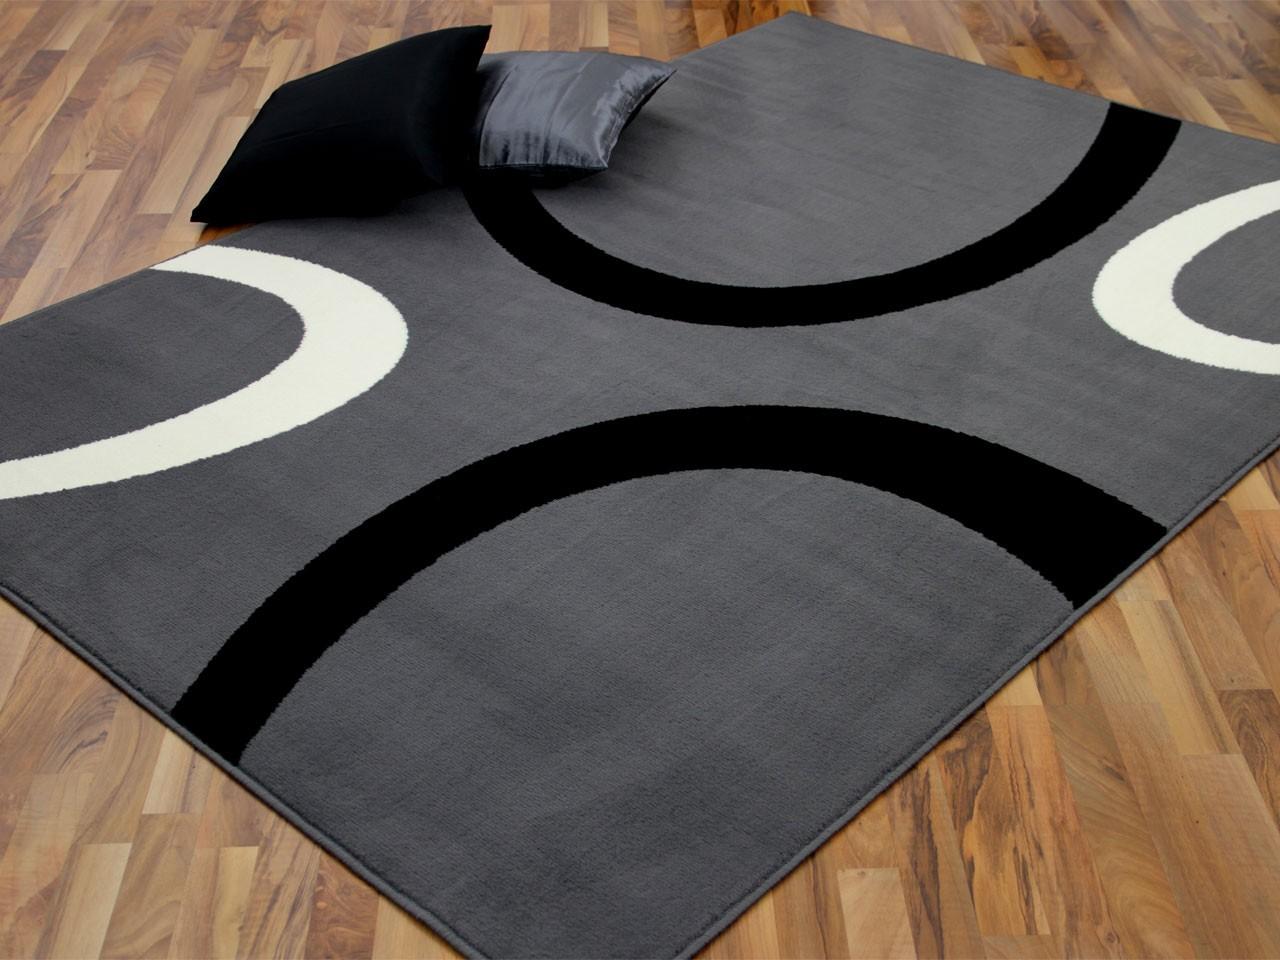 teppich trendline grau kreise in 4 gr en teppiche. Black Bedroom Furniture Sets. Home Design Ideas